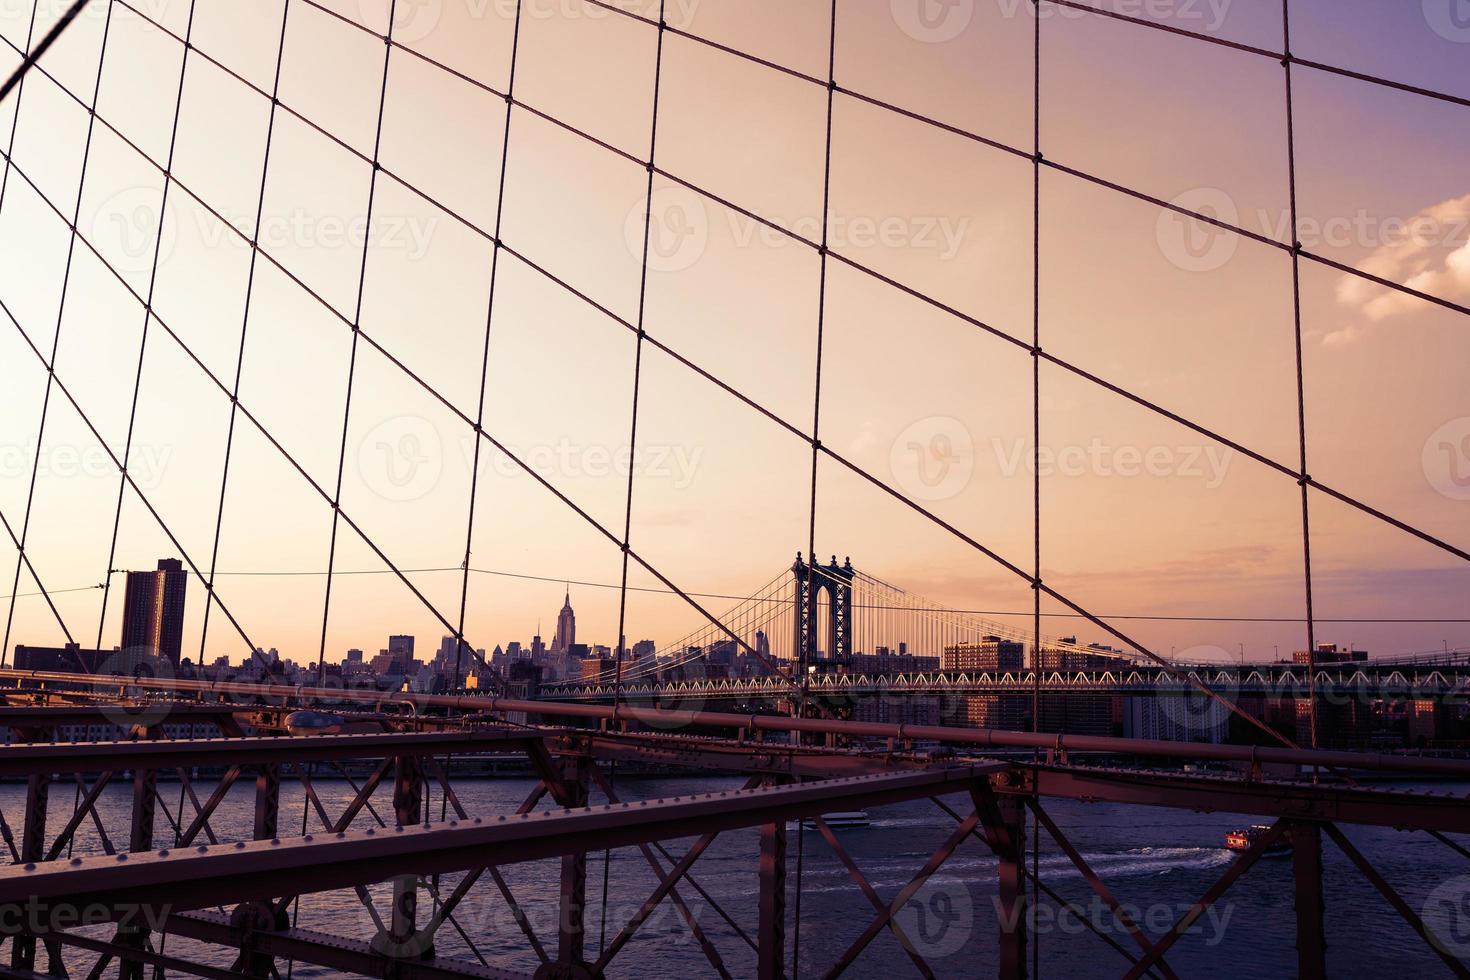 Manhattan Bridge dal ponte di Brooklyn a New York foto